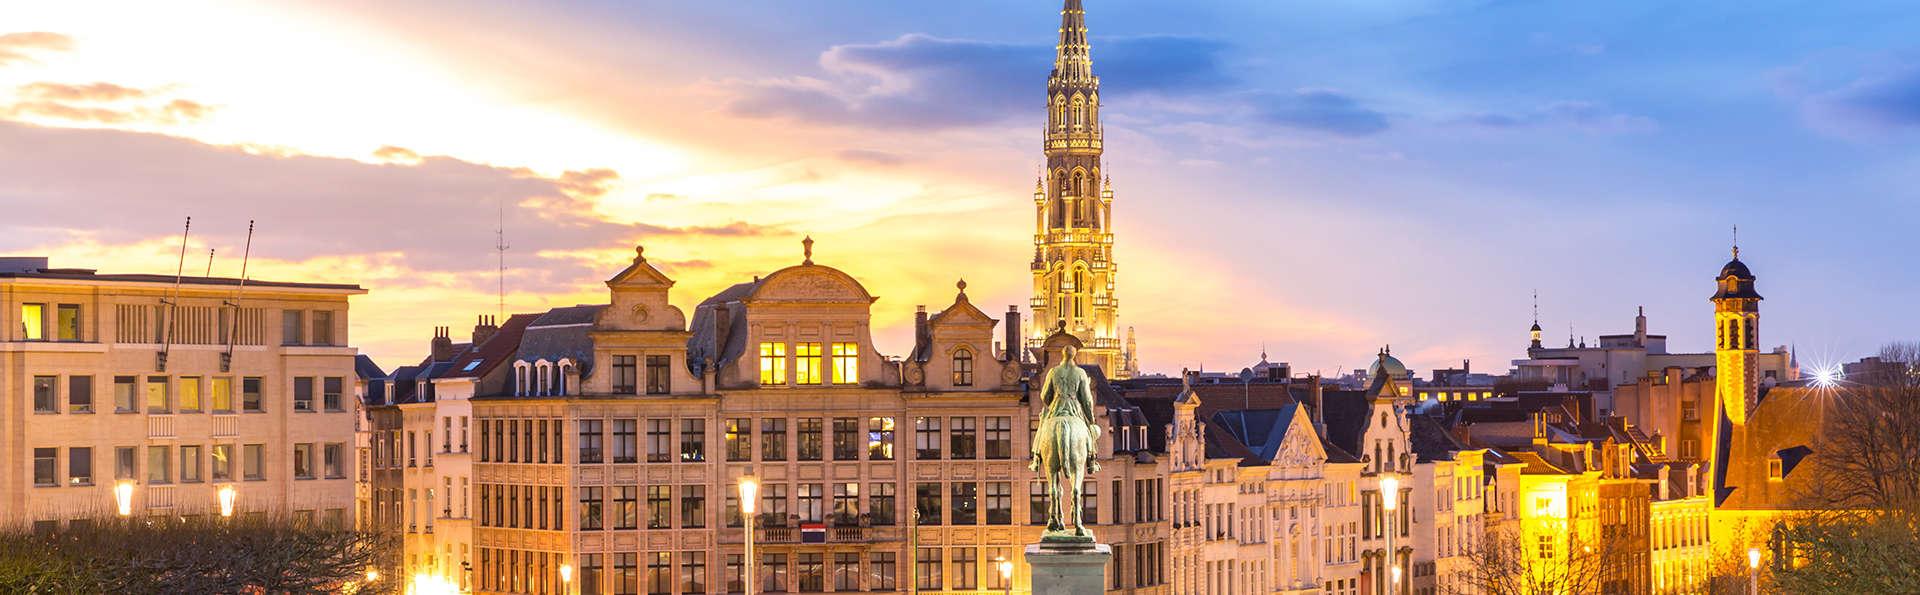 Smartflats Schuman - EDIT_BRUSSELS2.jpg